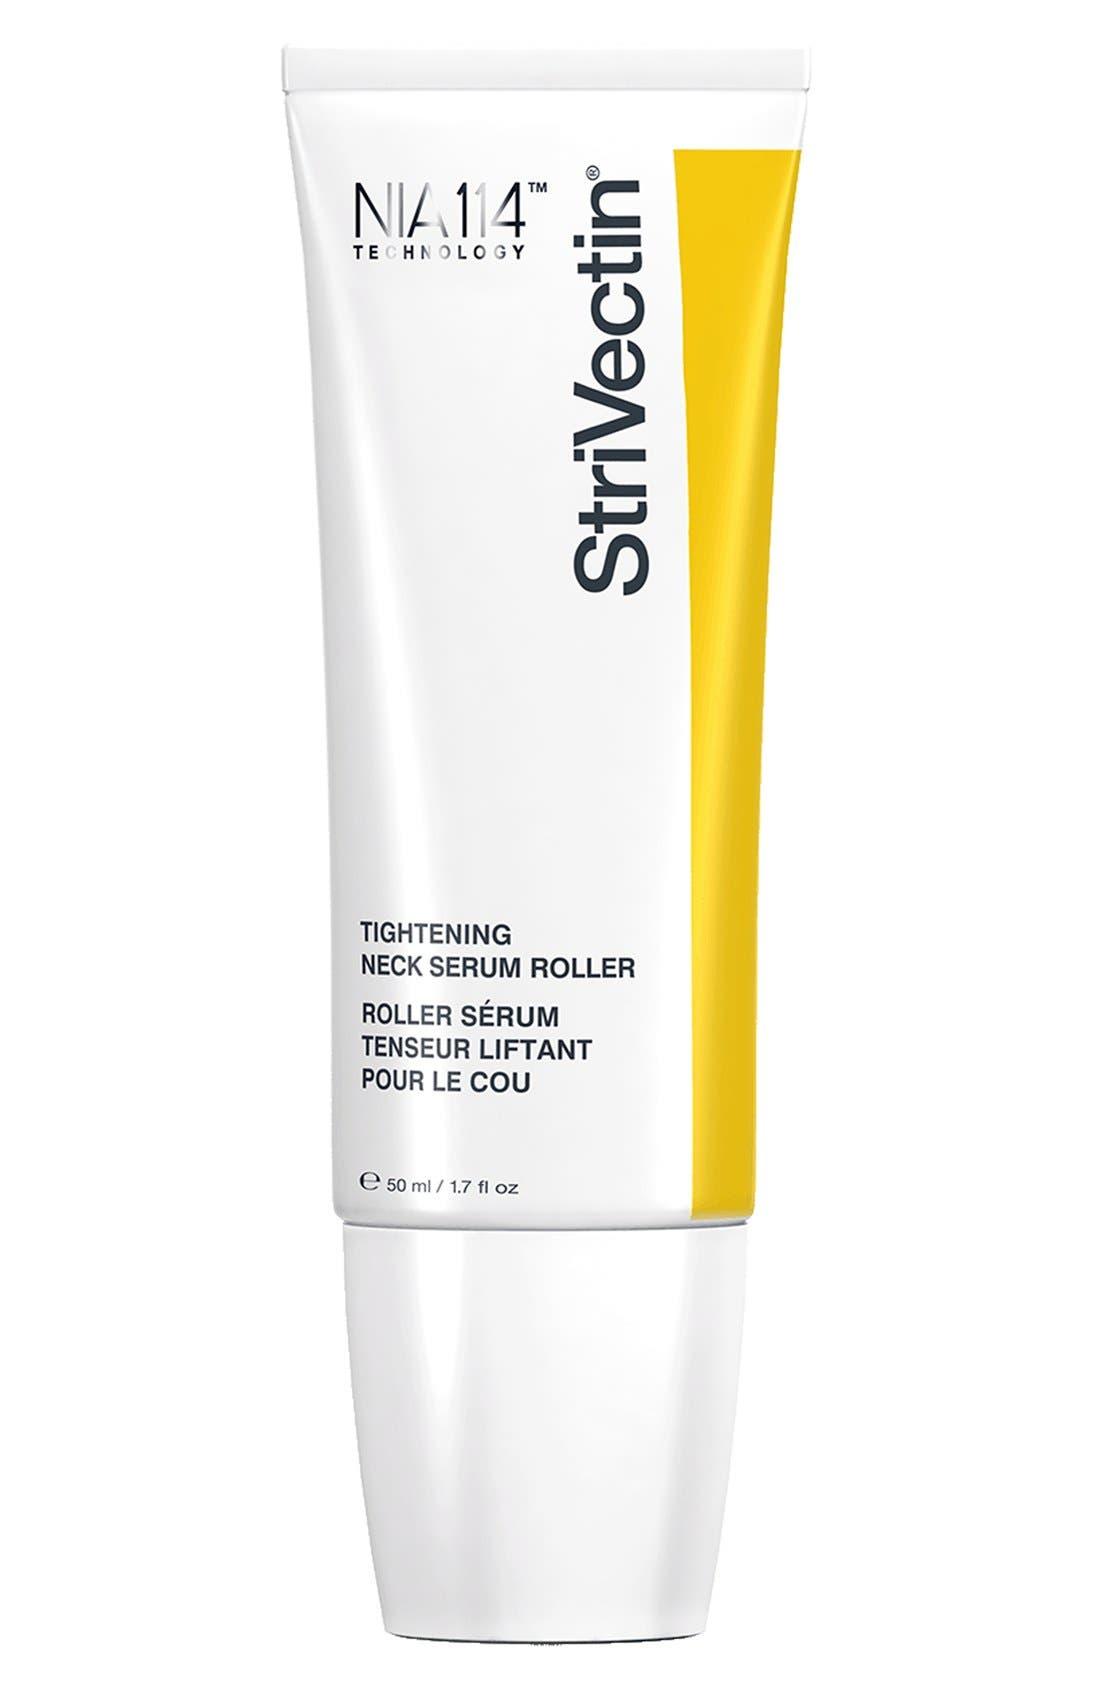 StriVectin-TL™ Tightening Neck Serum Roller